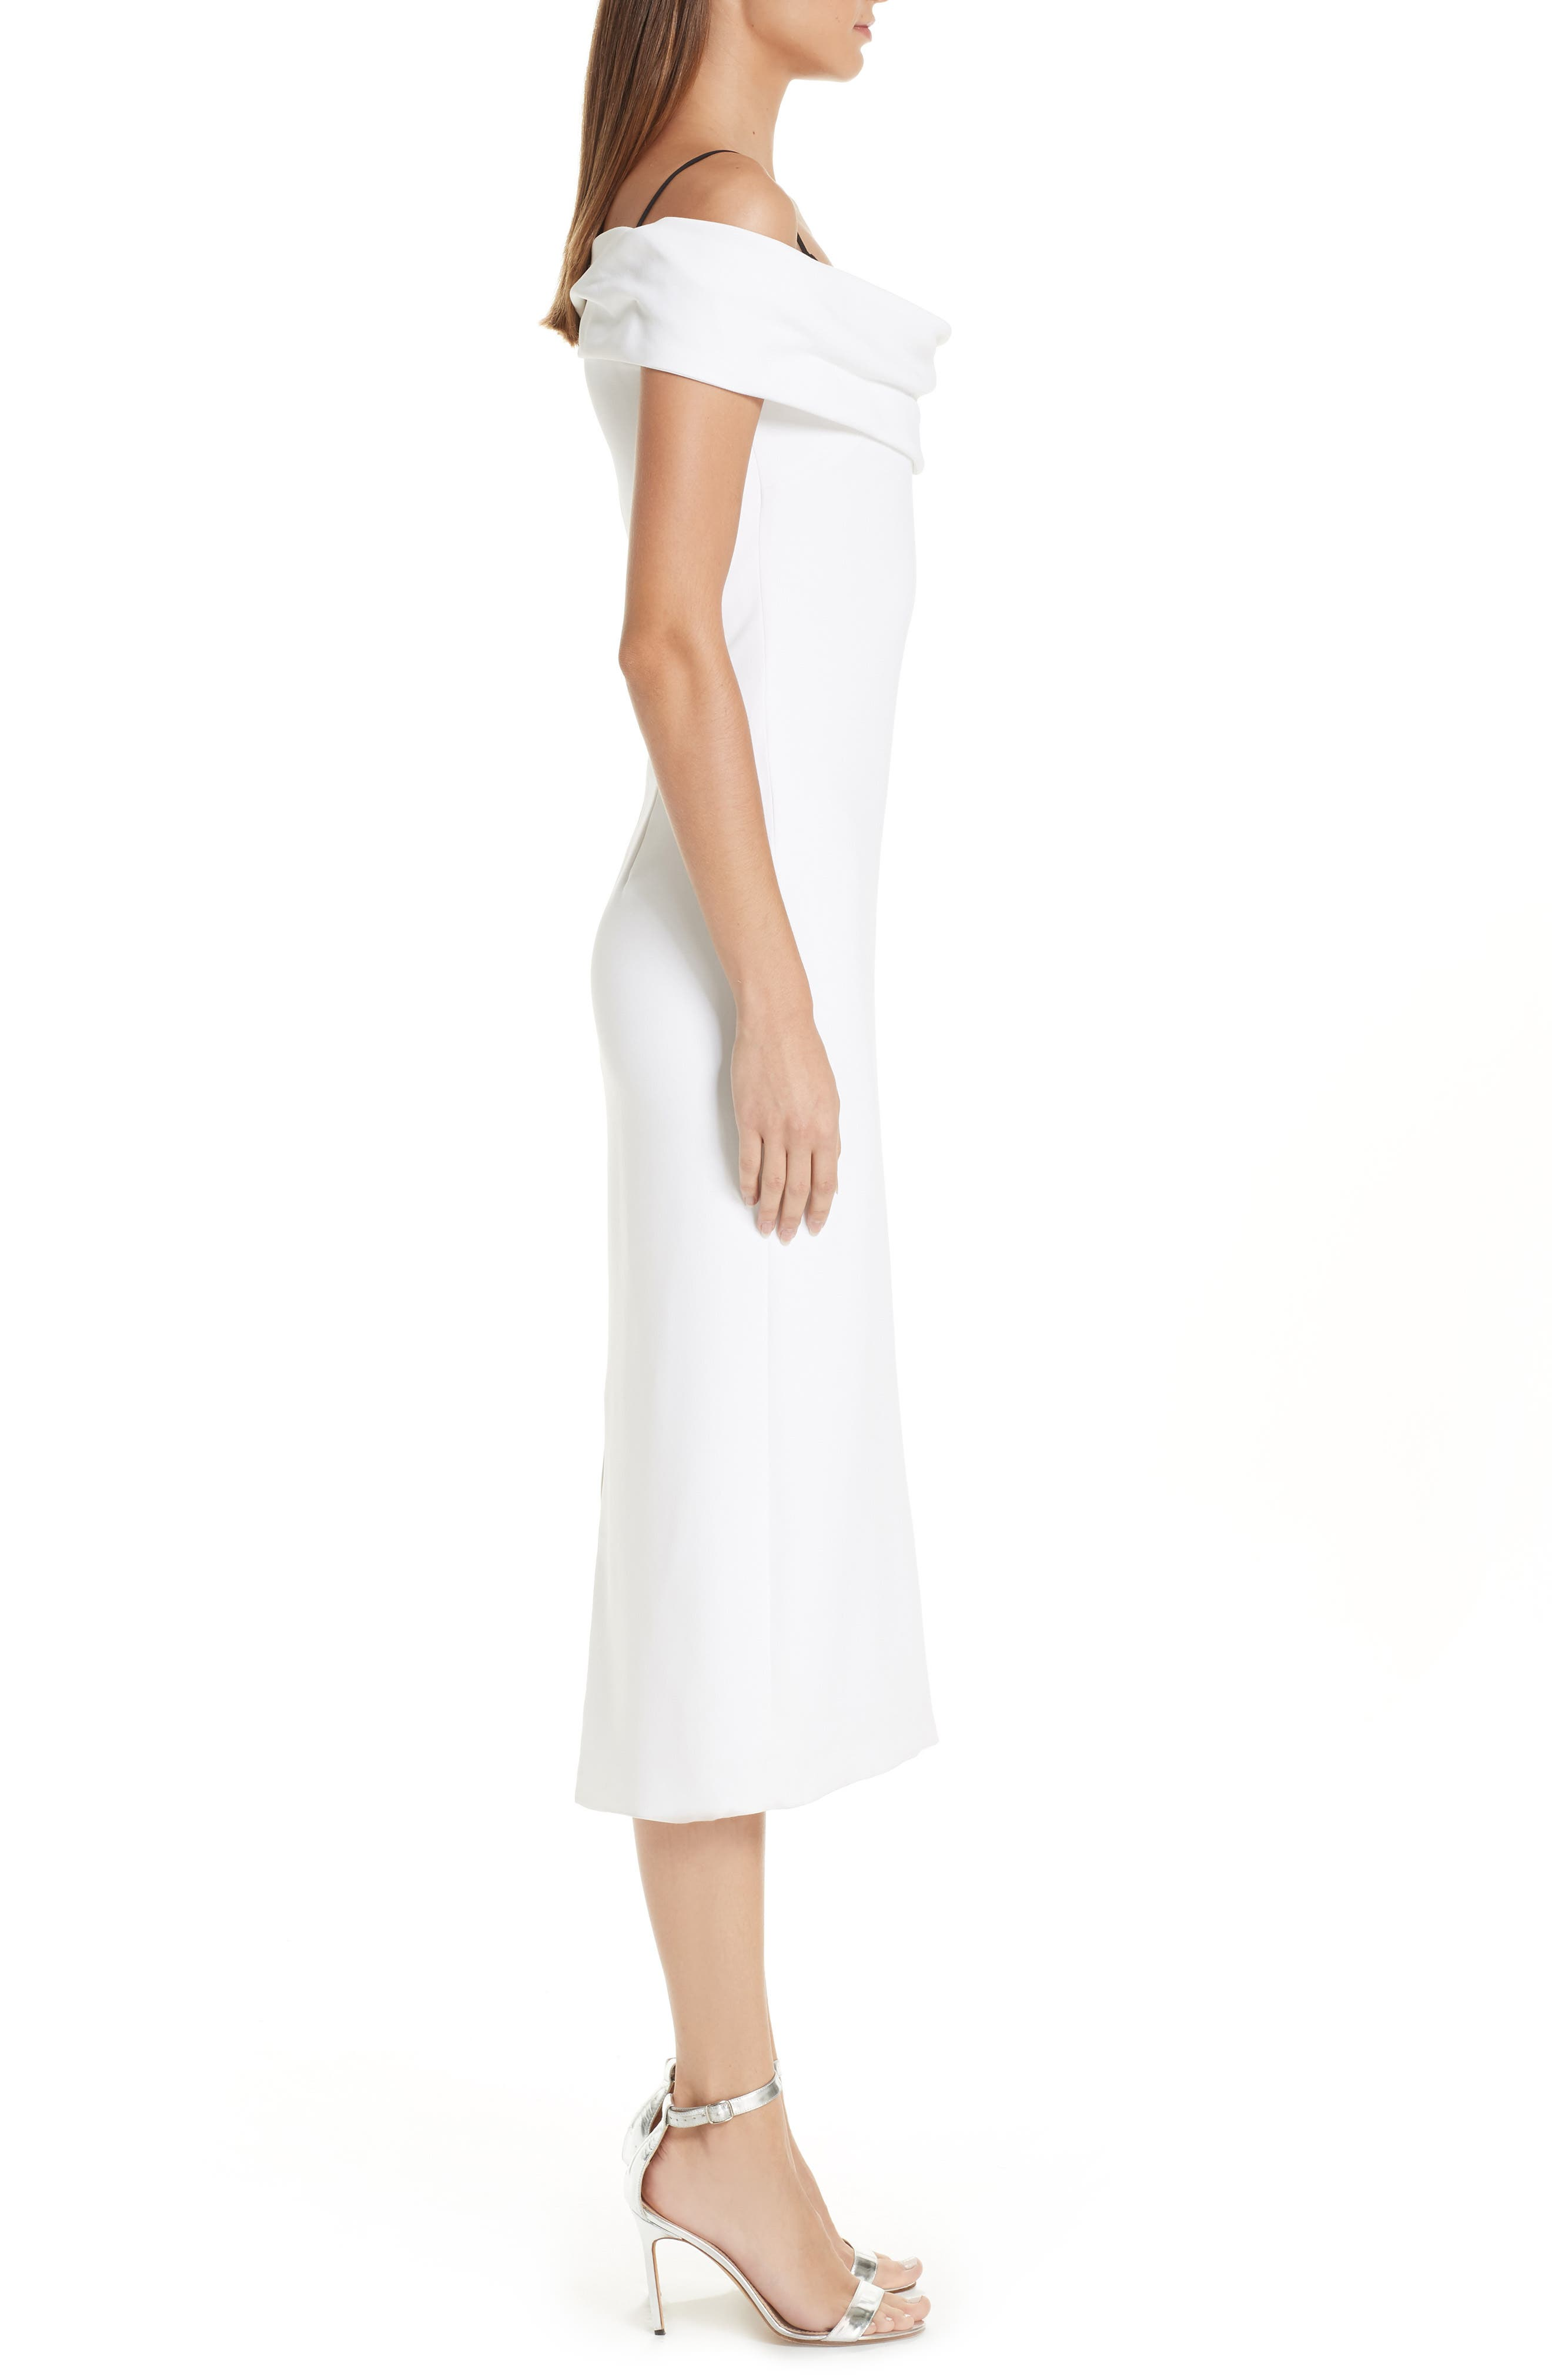 CUSHNIE, Layered Off the Shoulder Dress, Alternate thumbnail 4, color, WHITE/ BLACK